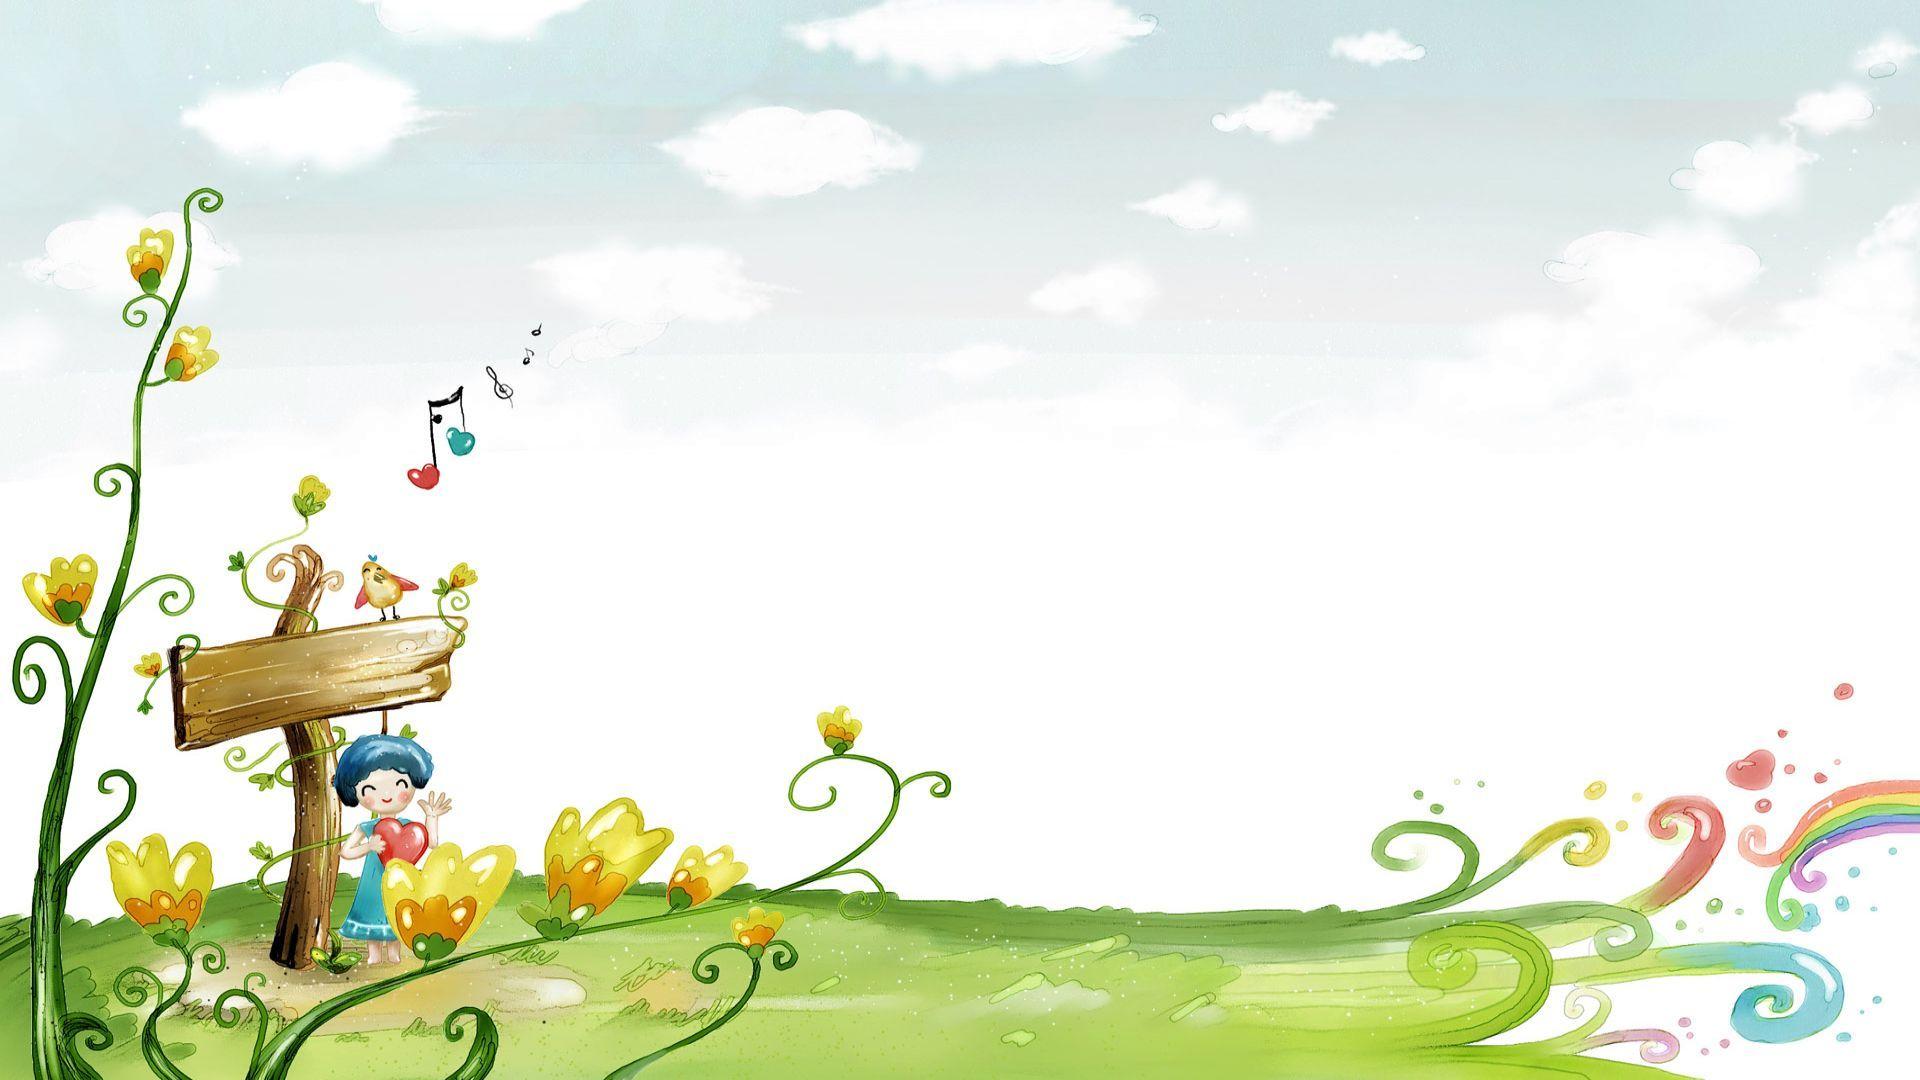 Happy Spring Day 1920x1080 Hd Wallpaper Cartoon Background Spring Illustration Cartoon Wallpapers